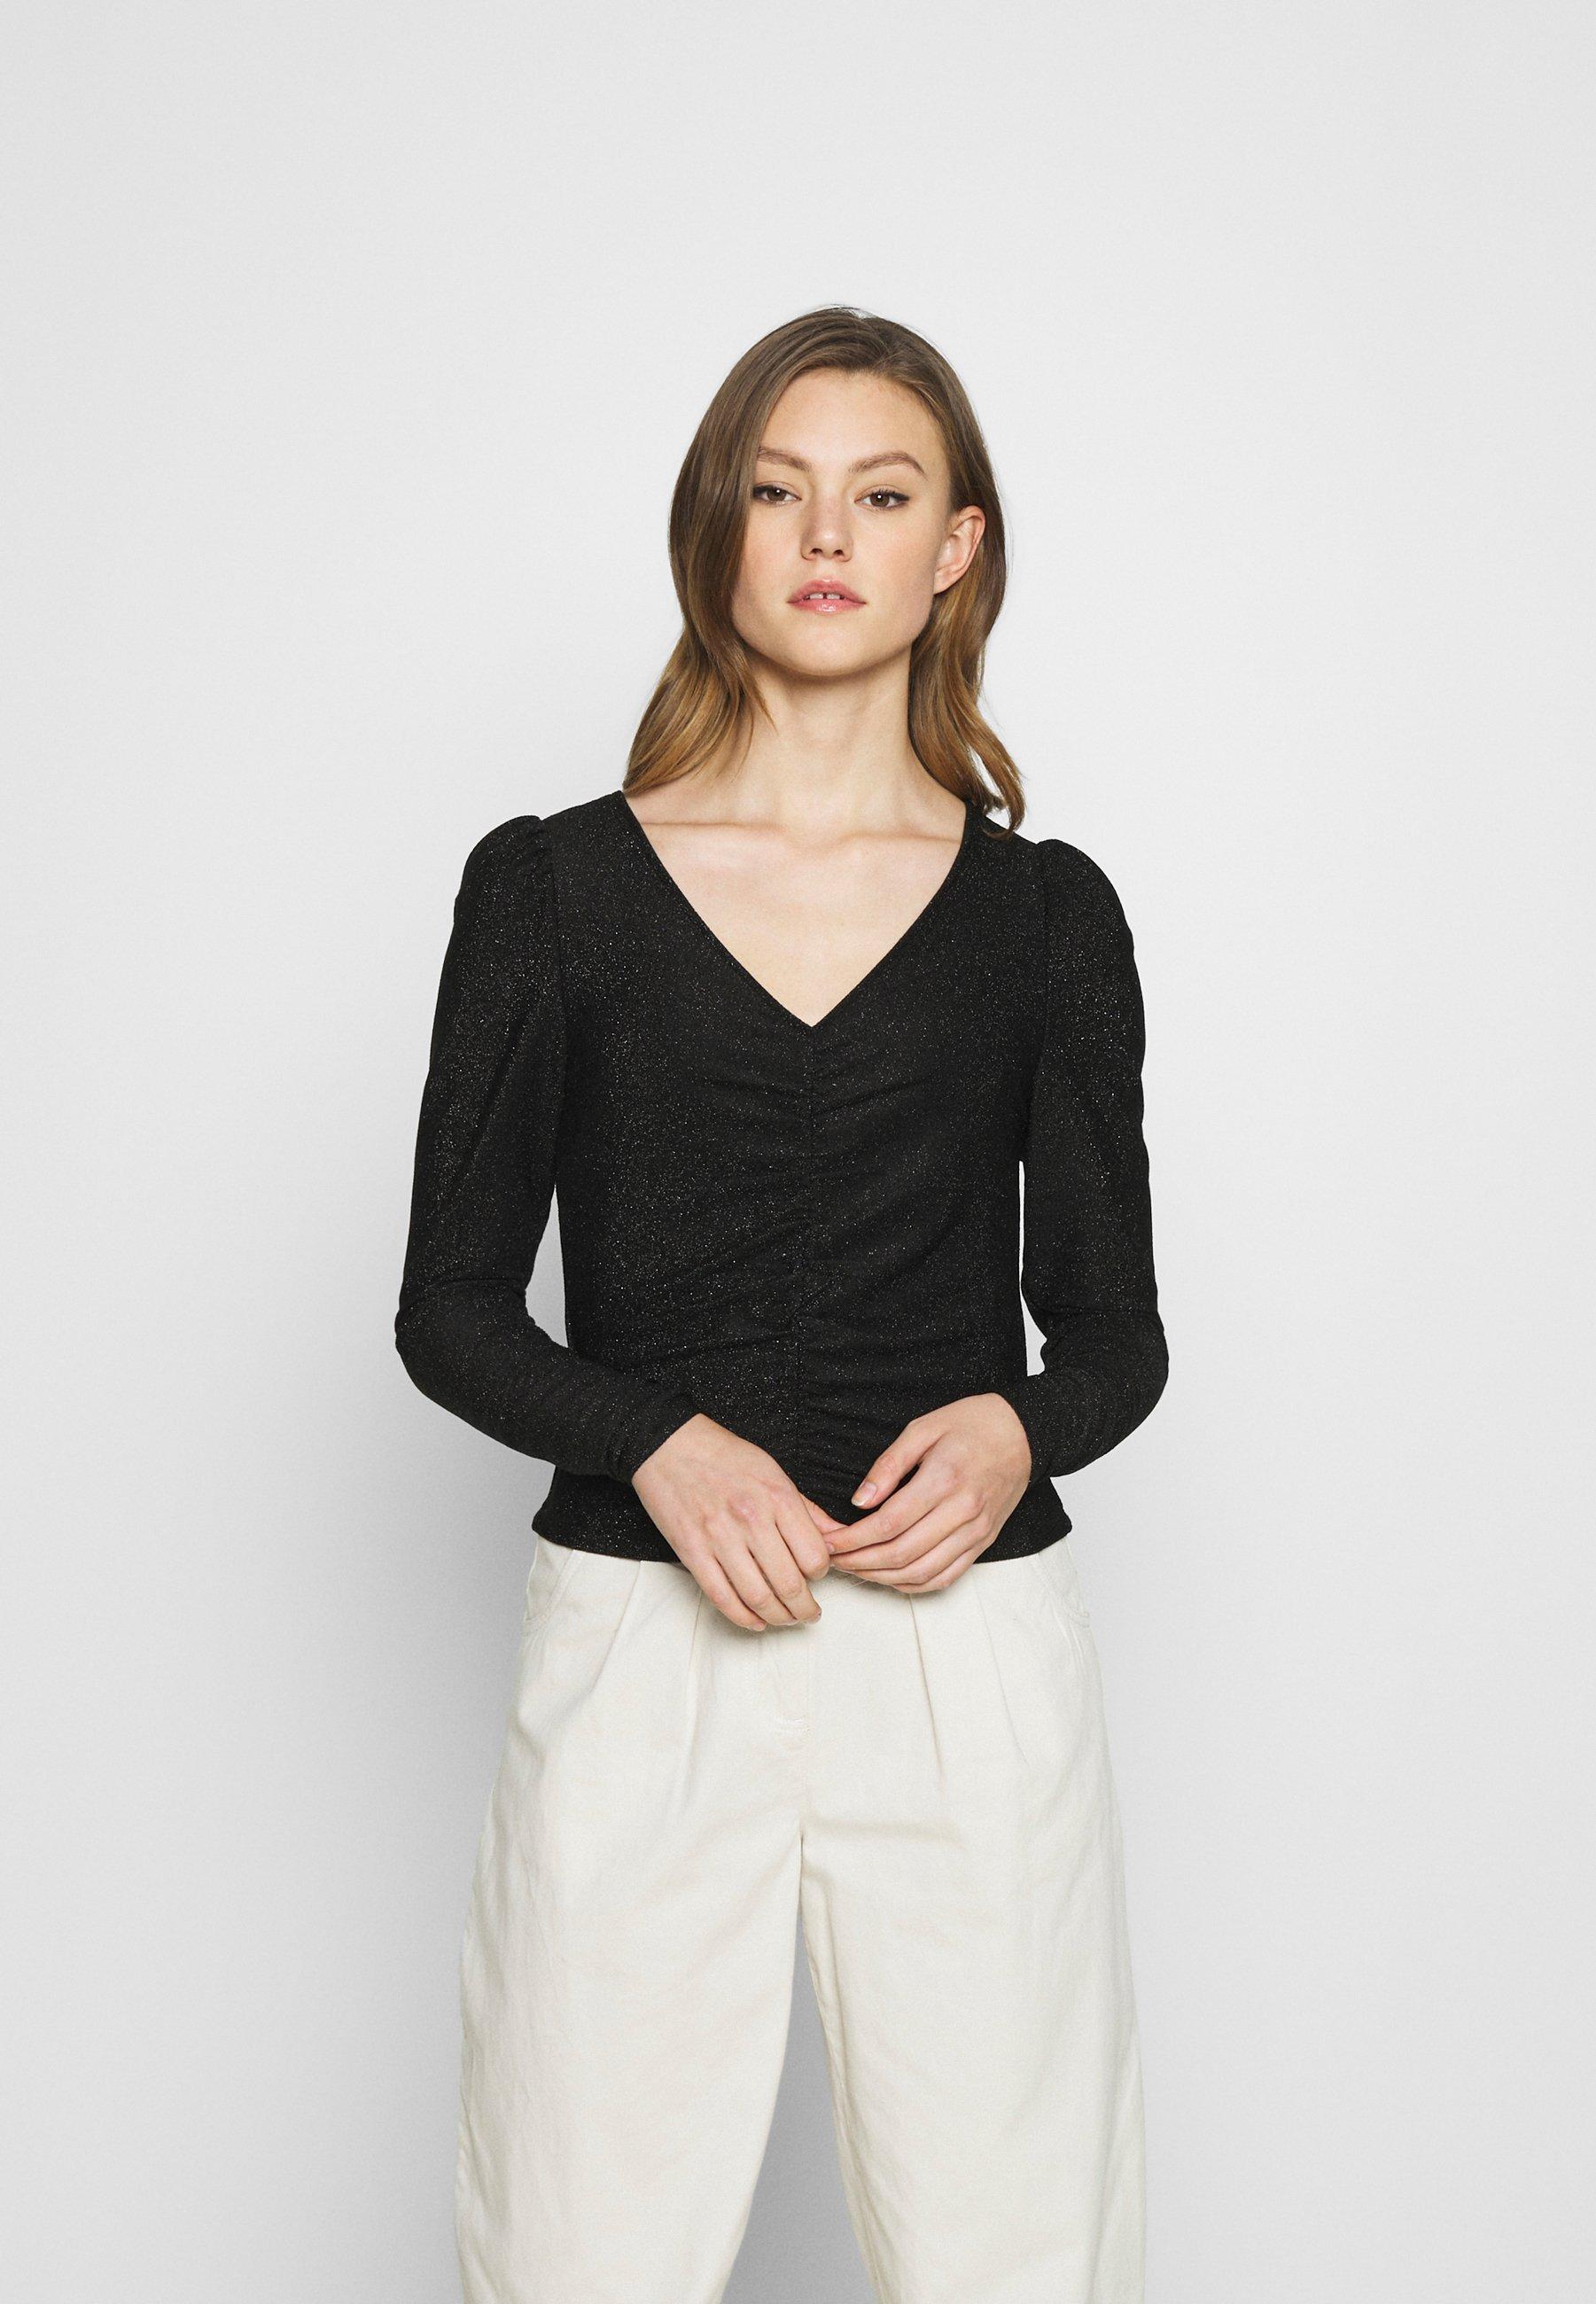 Women MAJLI - Long sleeved top - black